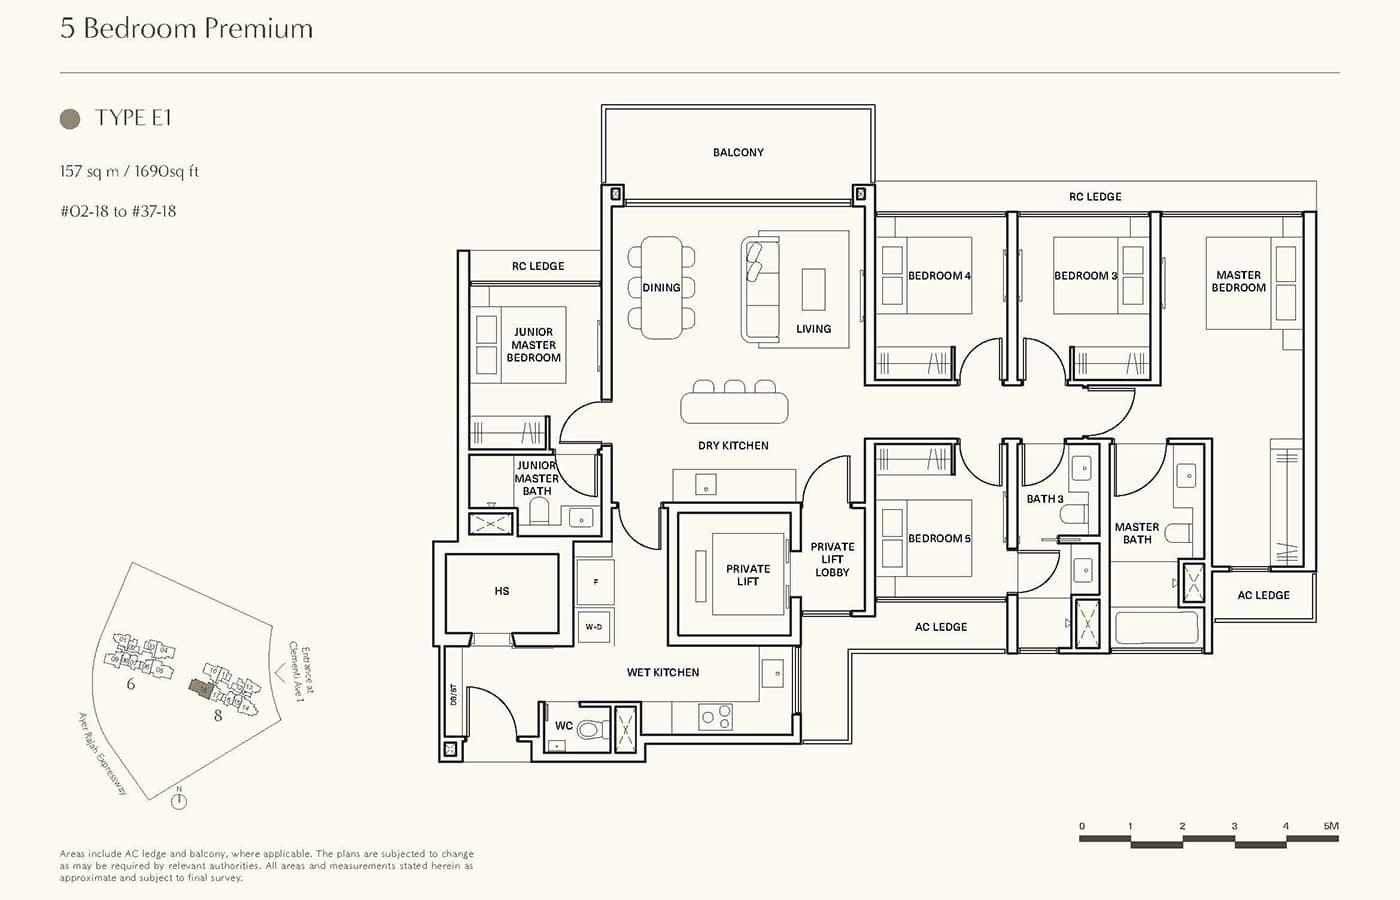 Clavon Condo Floor Plans - 5 Bedroom Premium E1